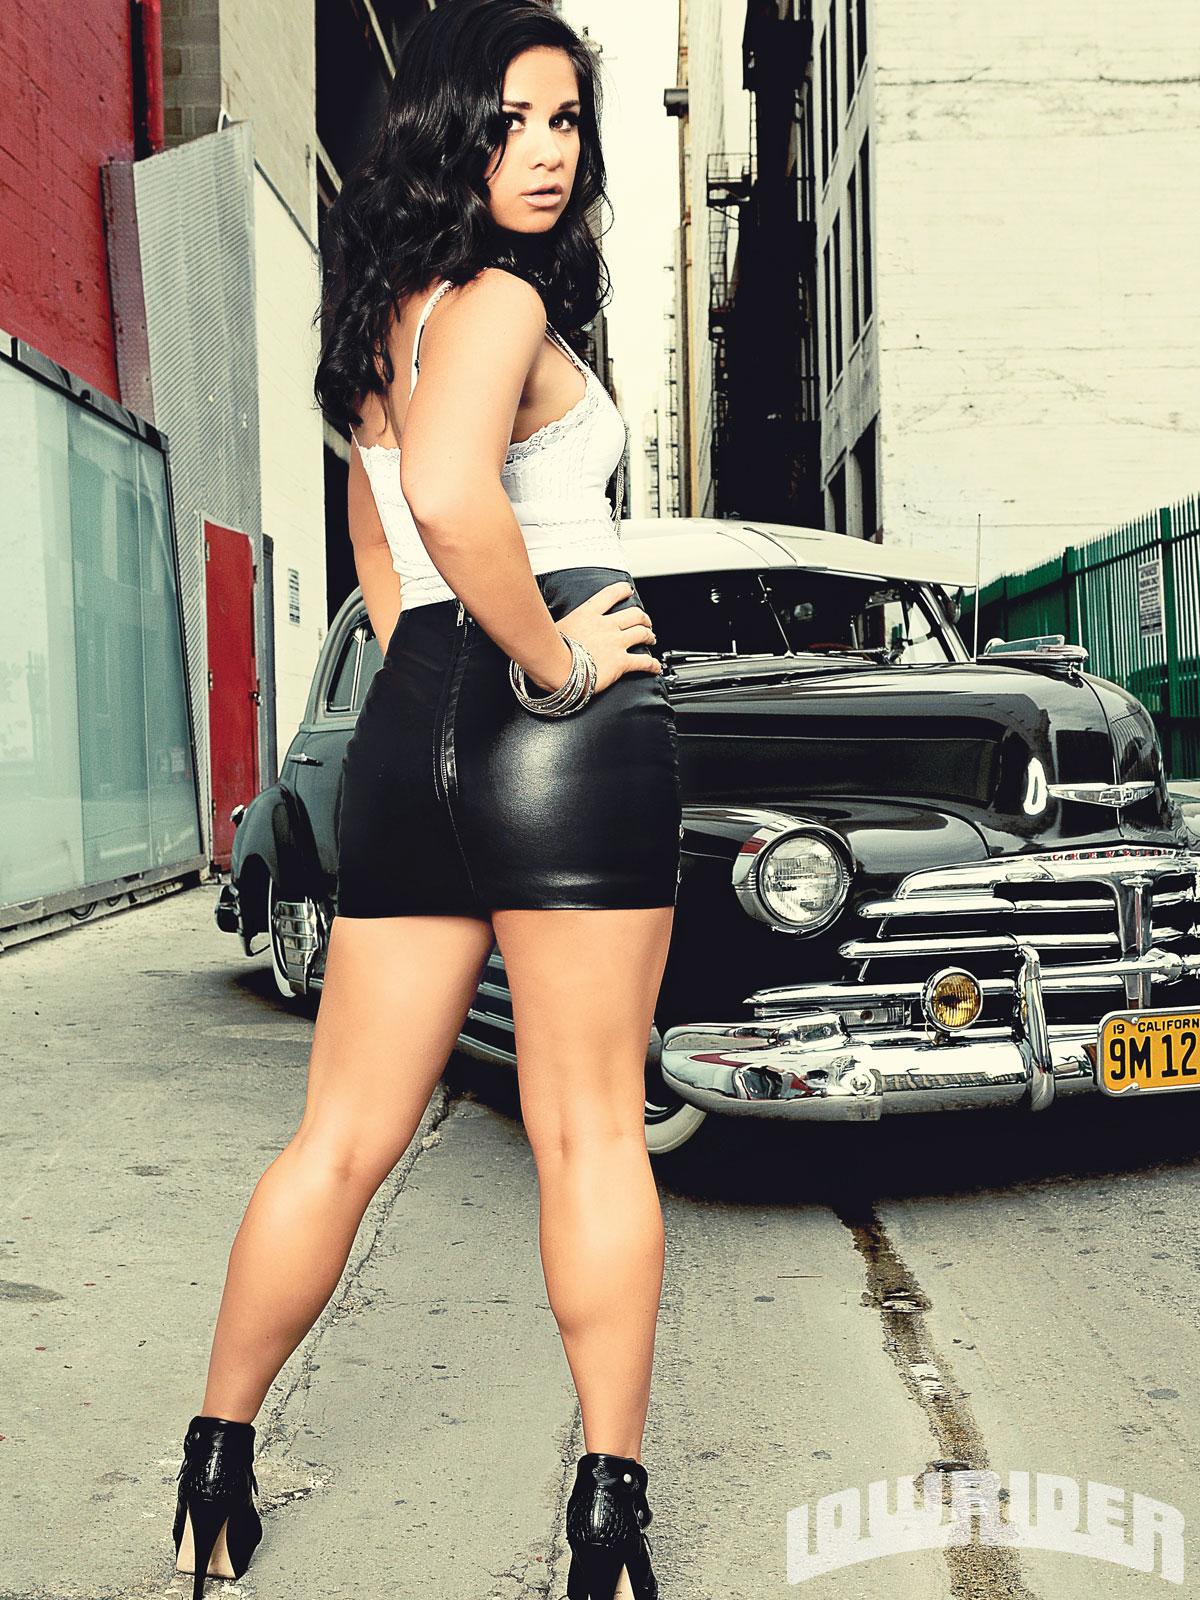 Beth Ella Lowrider Girls Model Lowrider Girls Magazine